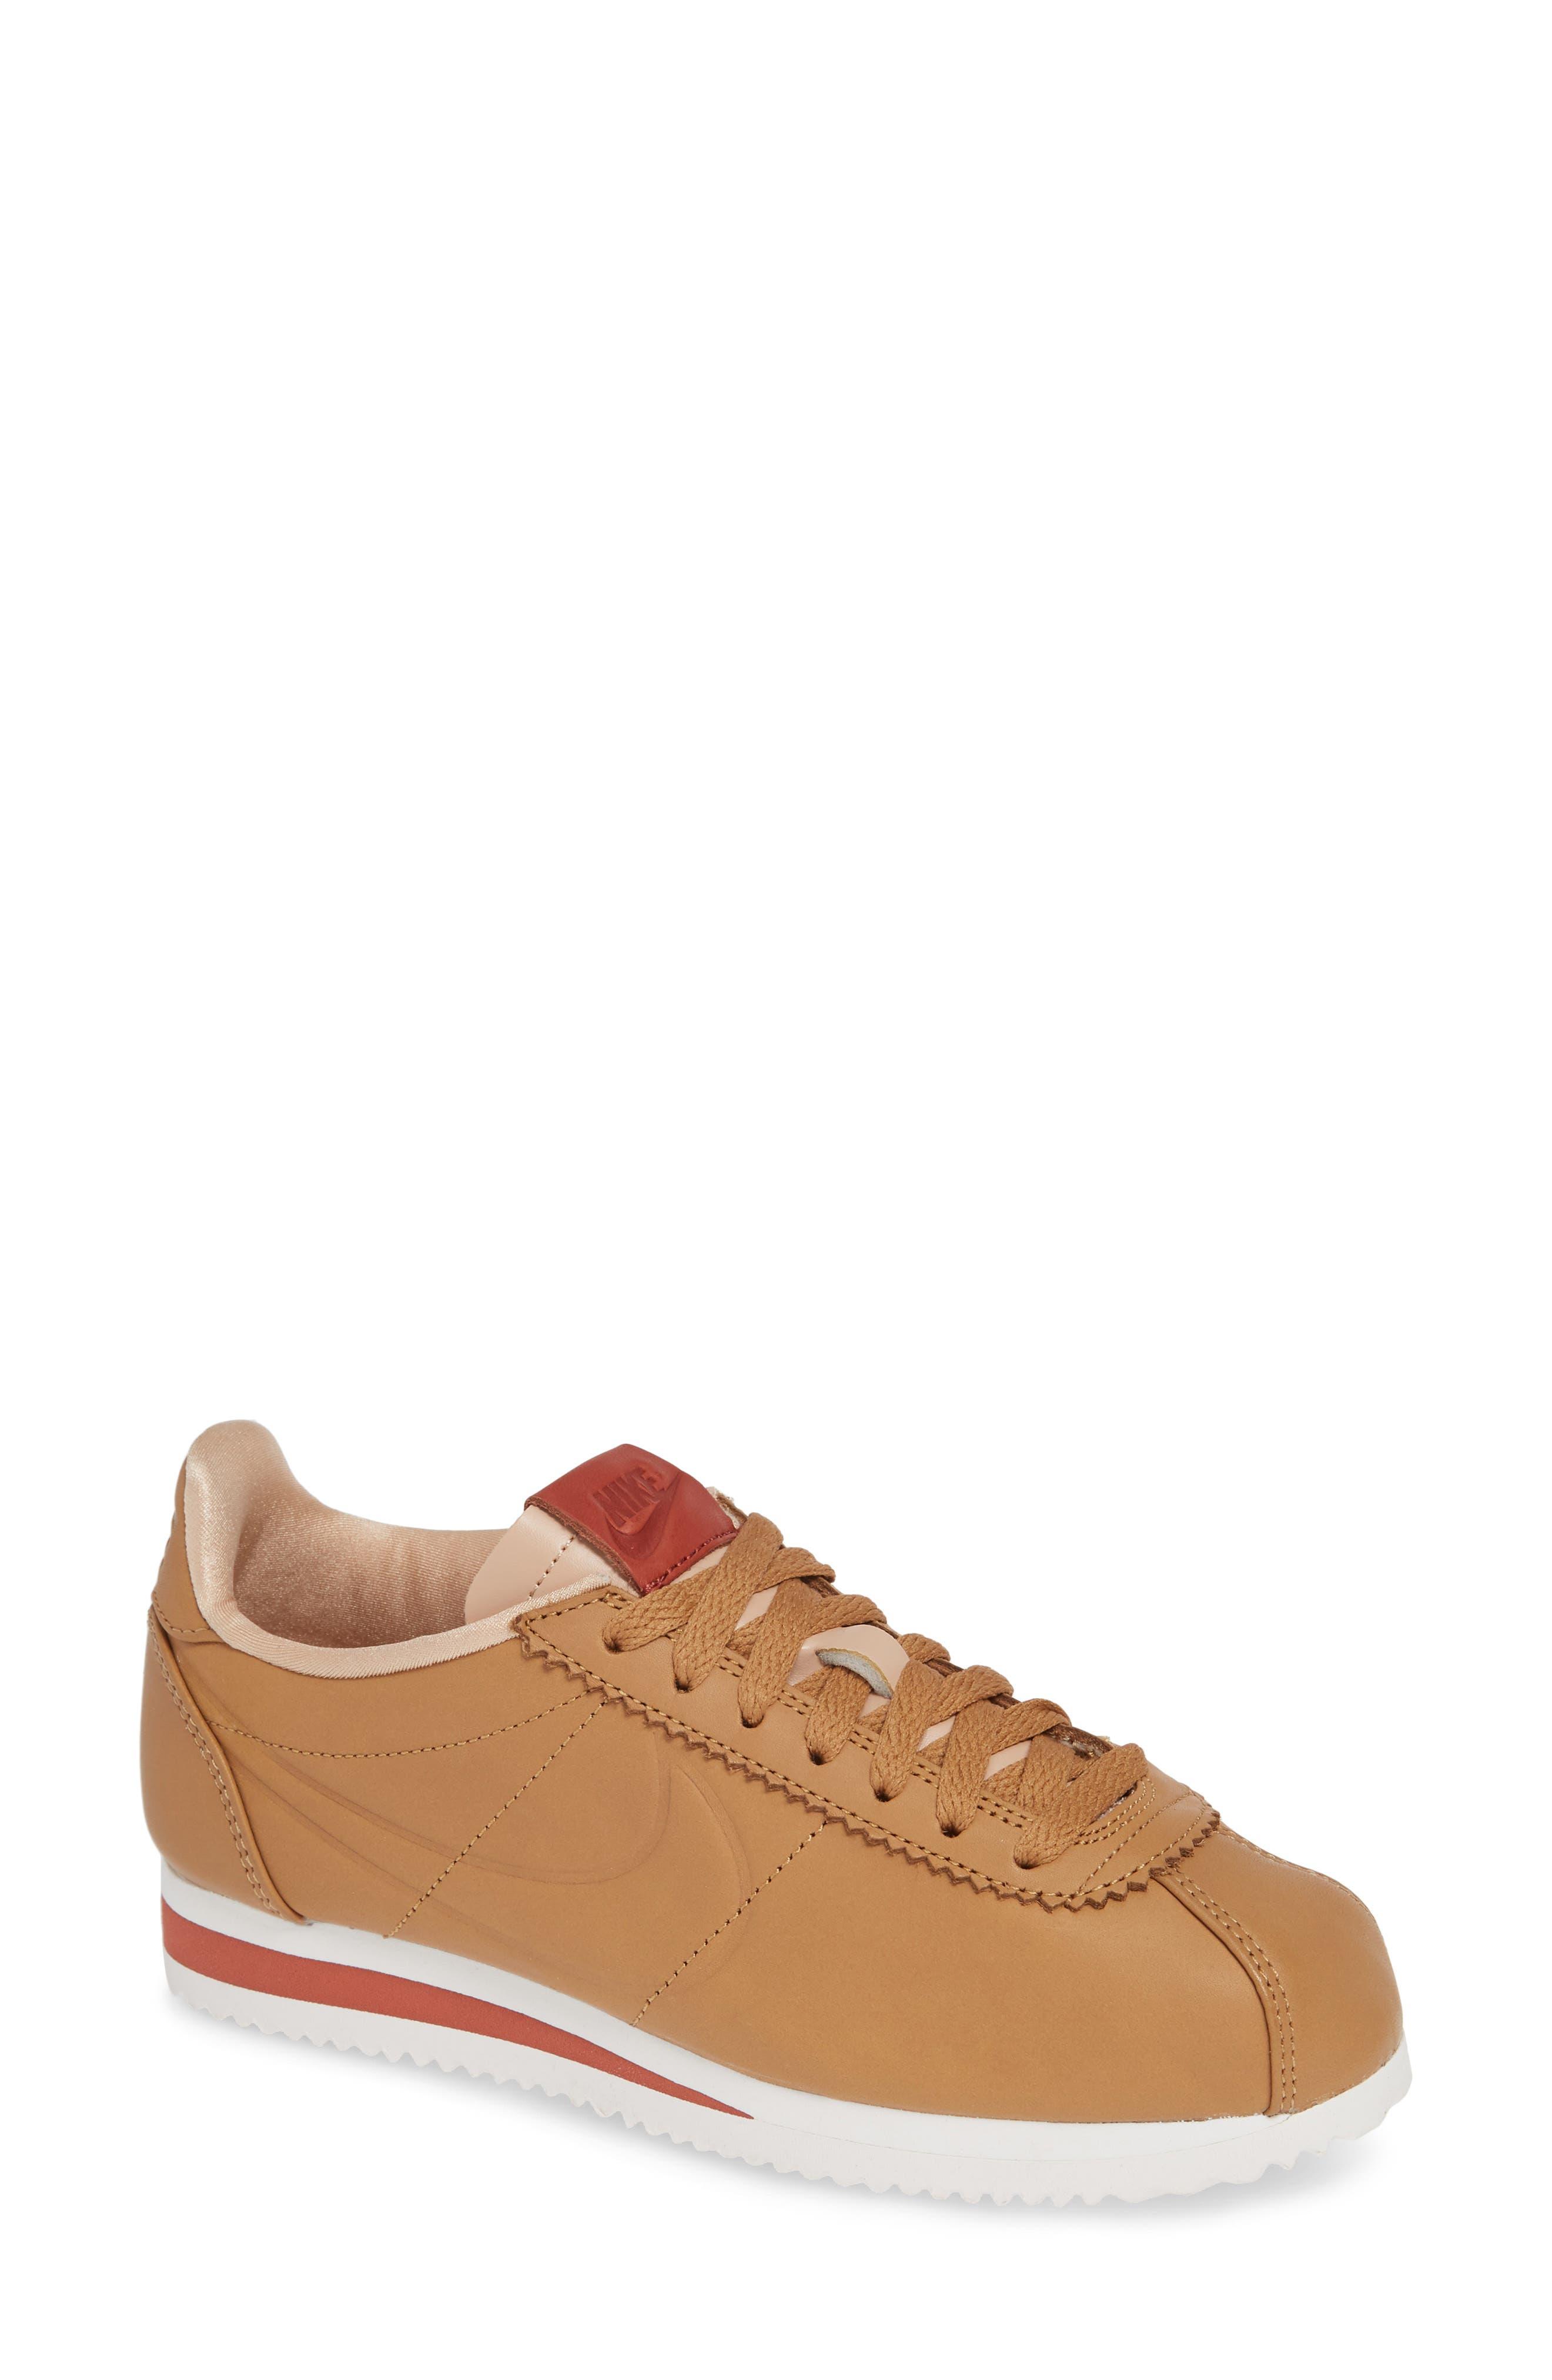 LA Cortez x Maria Sharapova Premium Sneaker,                             Main thumbnail 1, color,                             CAMEL/CAMEL